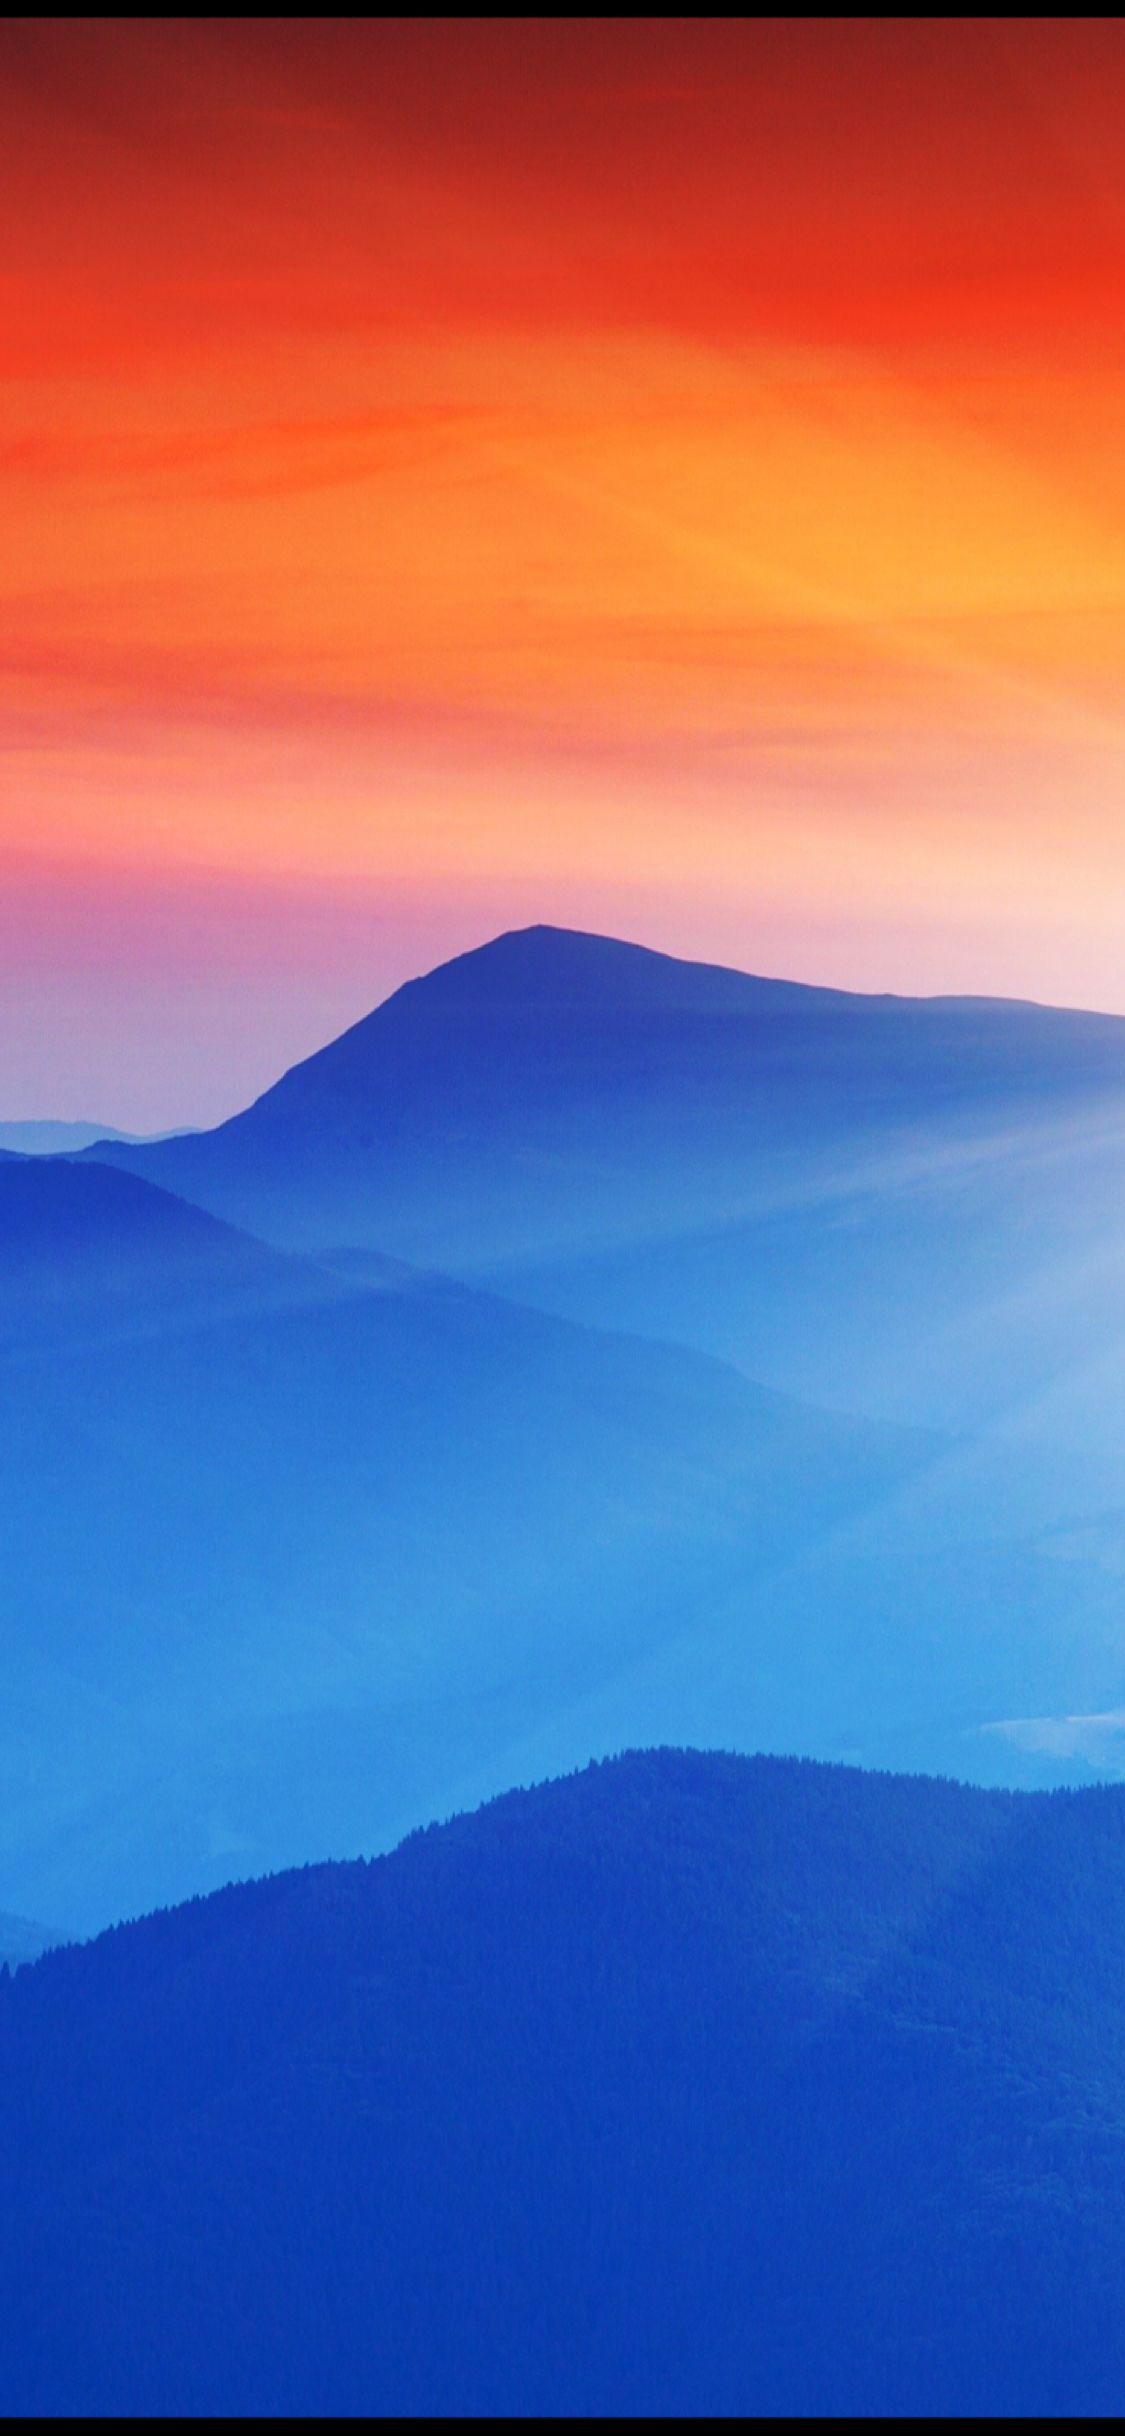 Blue Mountain And Orange Sky Iphone Wallpaper Sky Orange Sky